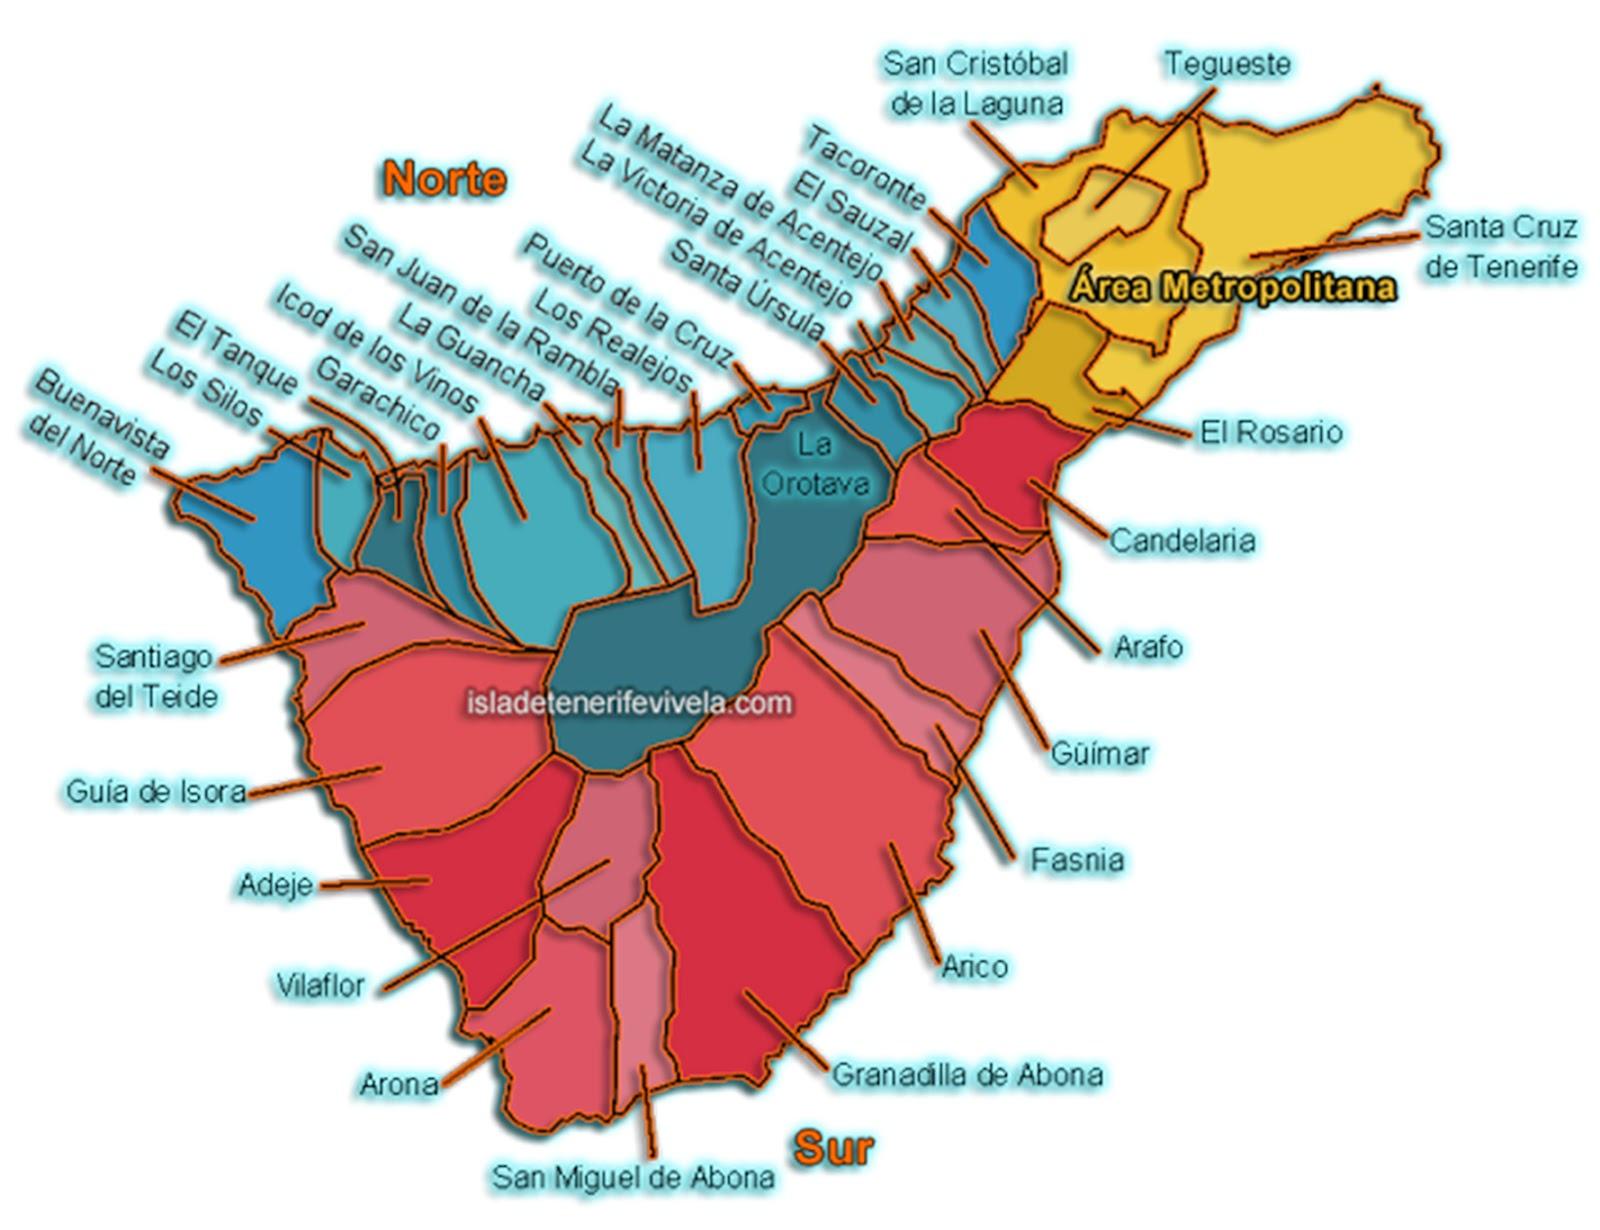 Mapa De Tenerife Municipios.Isla De Tenerife Vivela Municipios De Tenerife Alfabetico